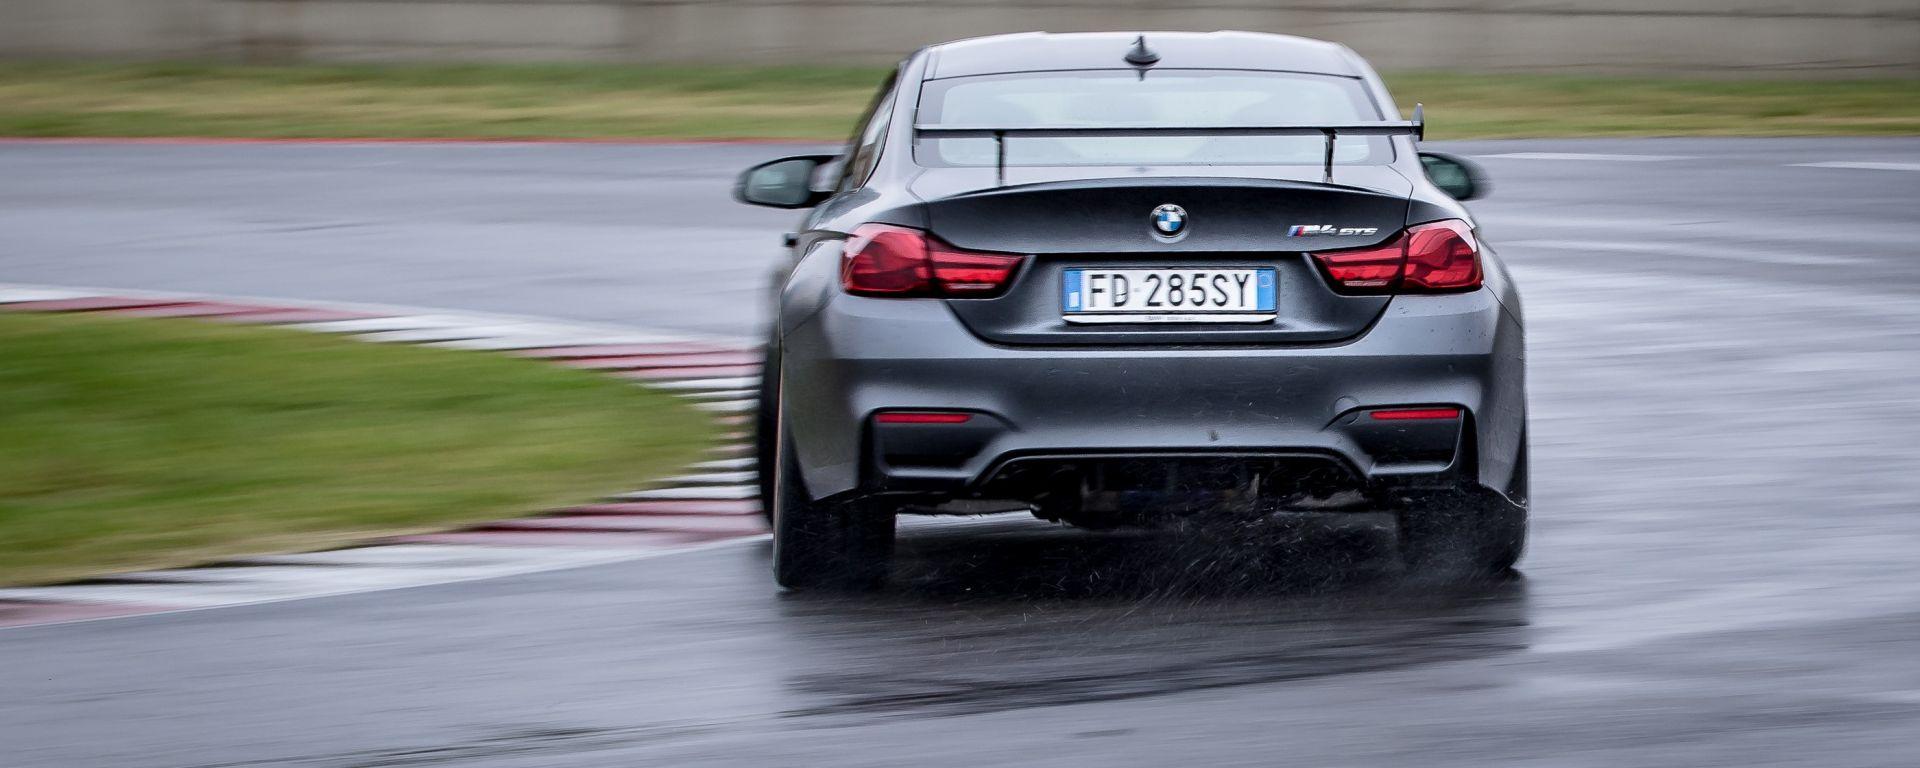 BMW M4 GTS: in pista con la belva